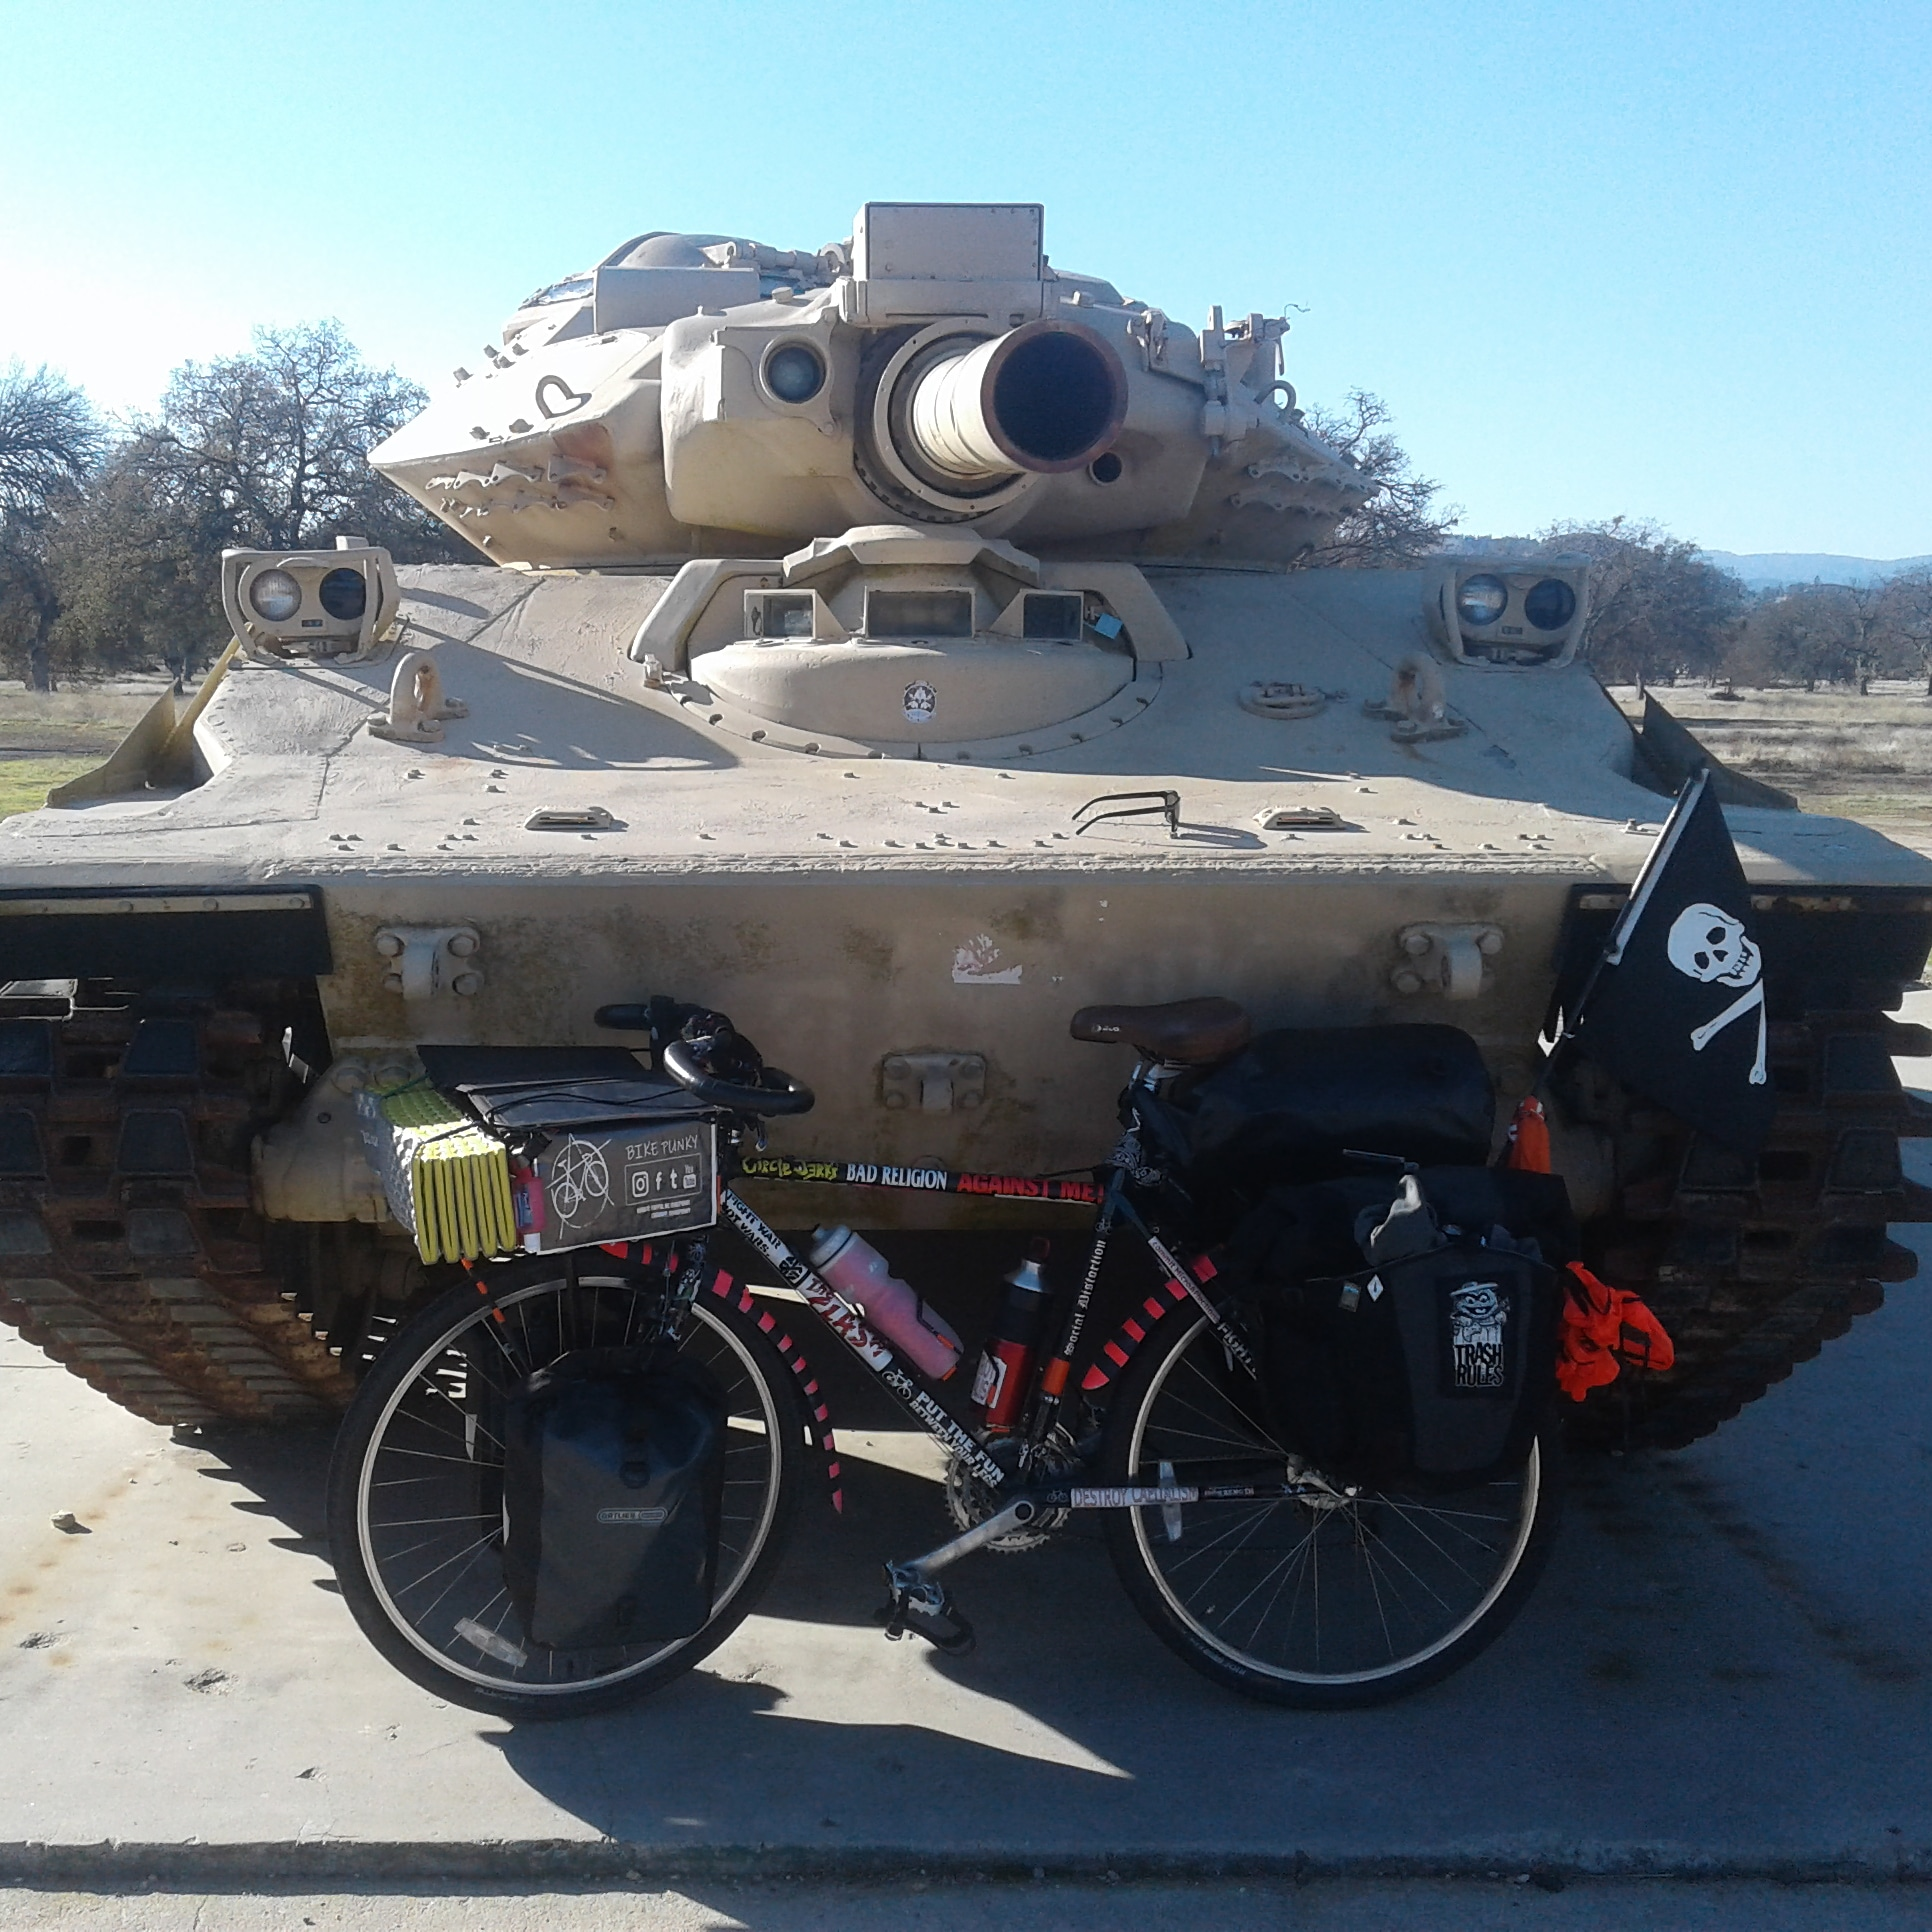 img_20190104_100859_714-jpg.48439_FIRST EVER BIKE TOUR (PICS)_Bike Touring_Squat the Planet_2:26 PM